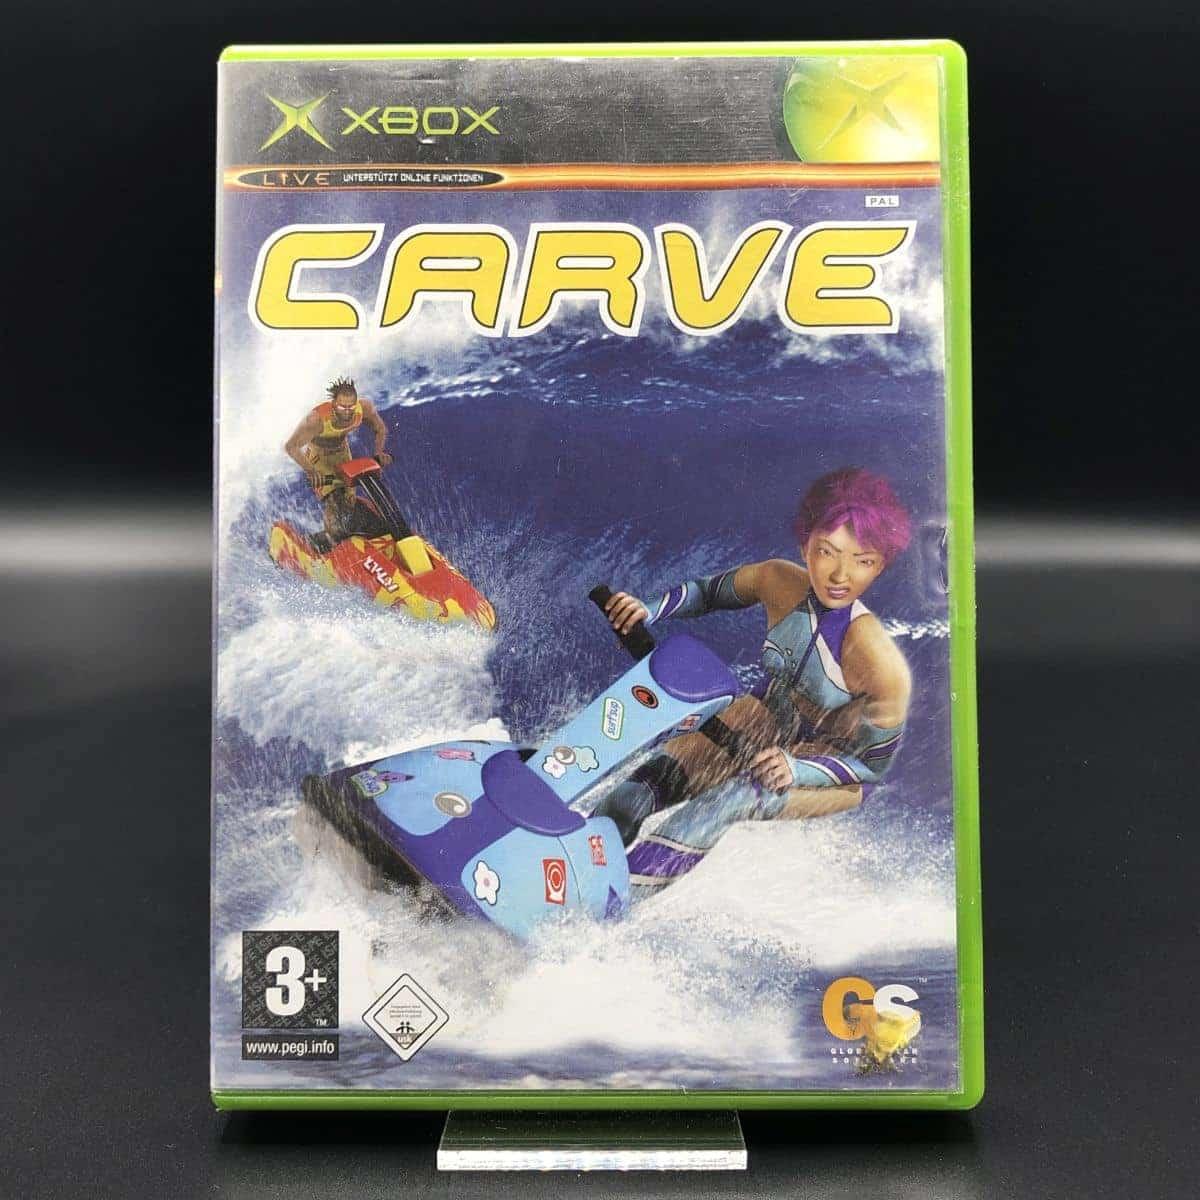 XBC Carve (Komplett) (Sehr gut) Microsoft Xbox Classic